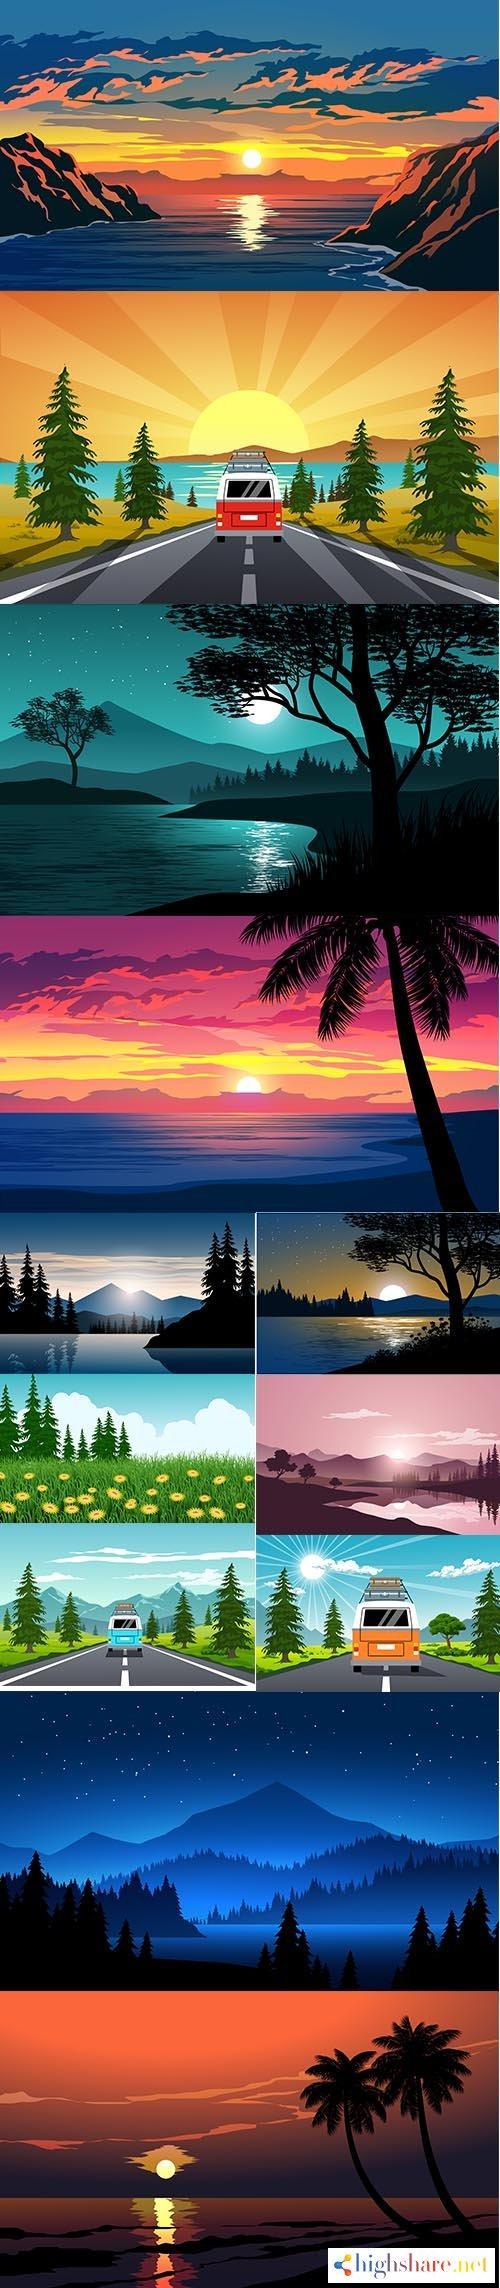 beautiful nature background set 5f409d2c6d048 - Beautiful Nature Background Set